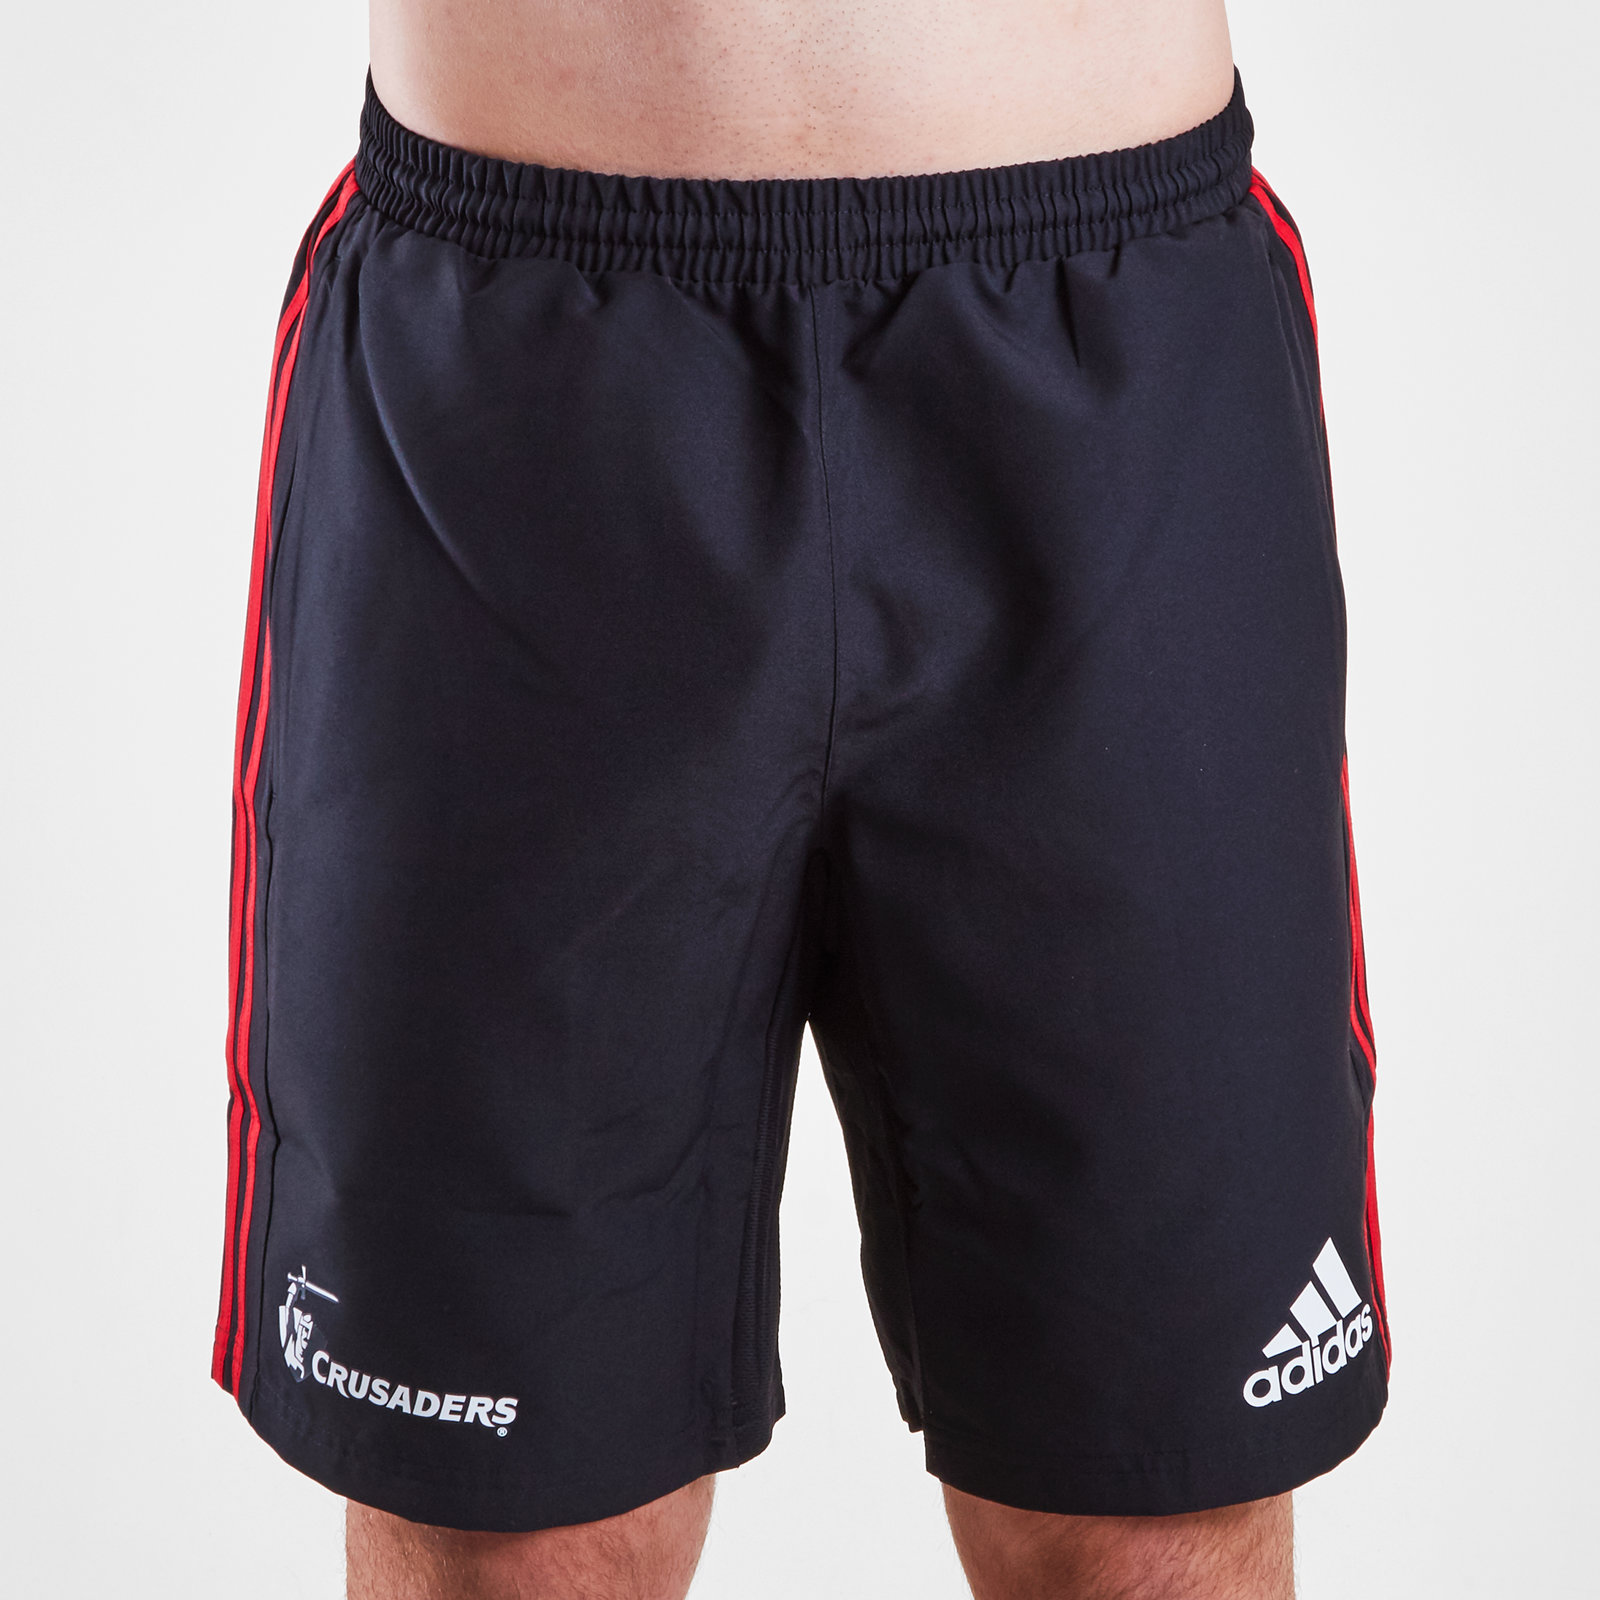 Sweat Rugby Homme Crusaders 2018 2019 – Adidas